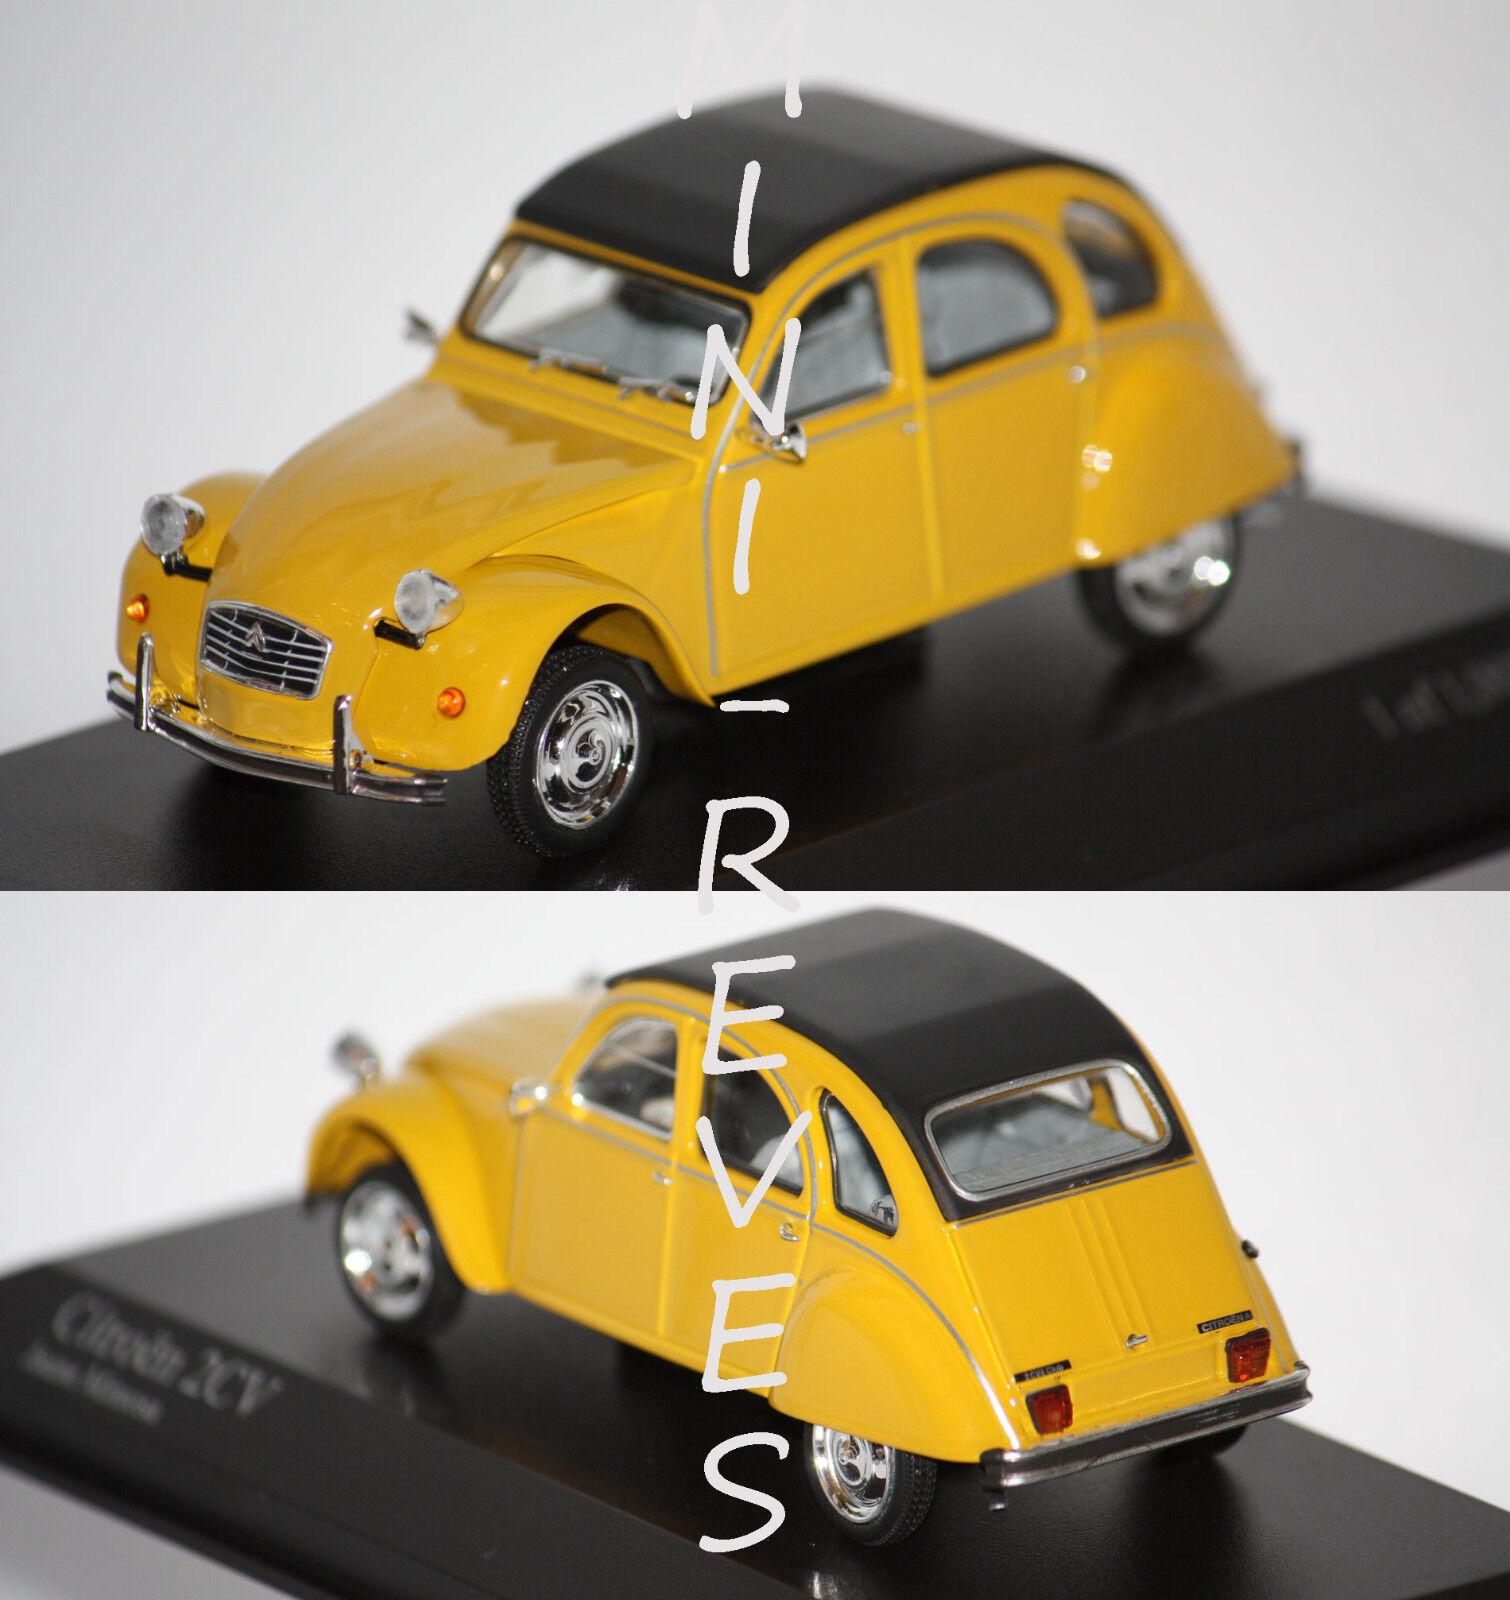 alta qualità generale Minichamps Minichamps Minichamps Citroën 2cv 1980 Gituttia 1 43 400111502  Negozio 2018